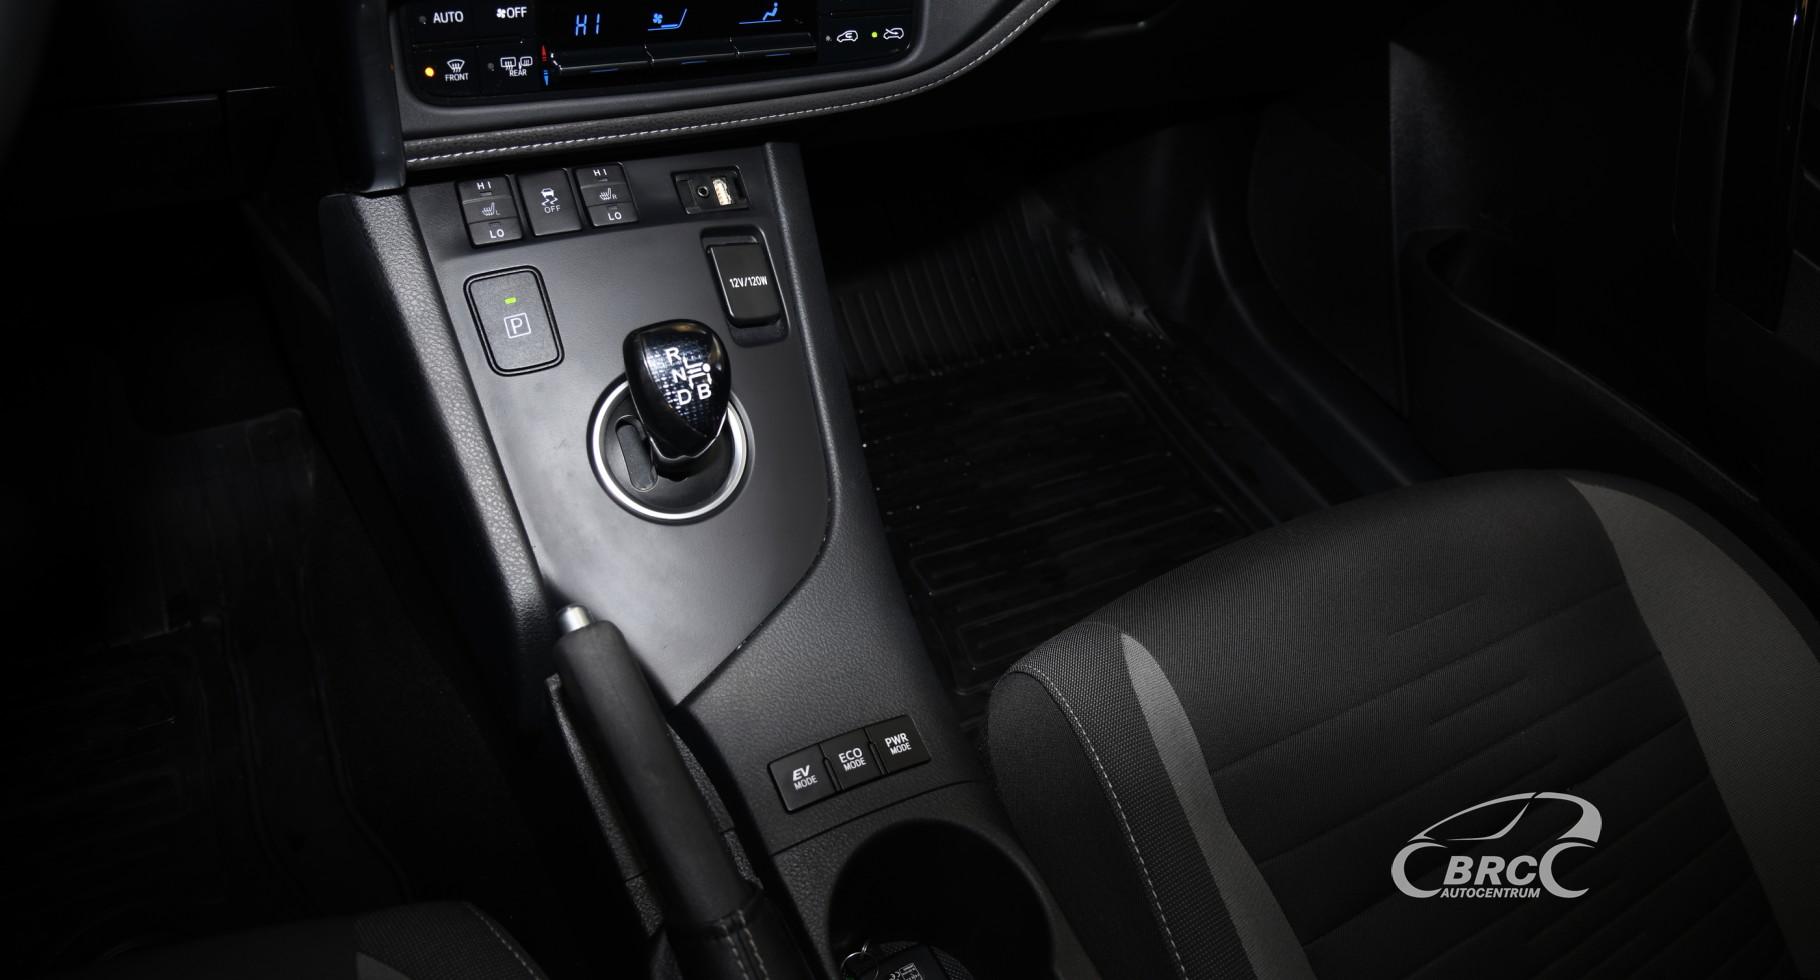 Toyota Auris 1.8i Hybrid Automatas